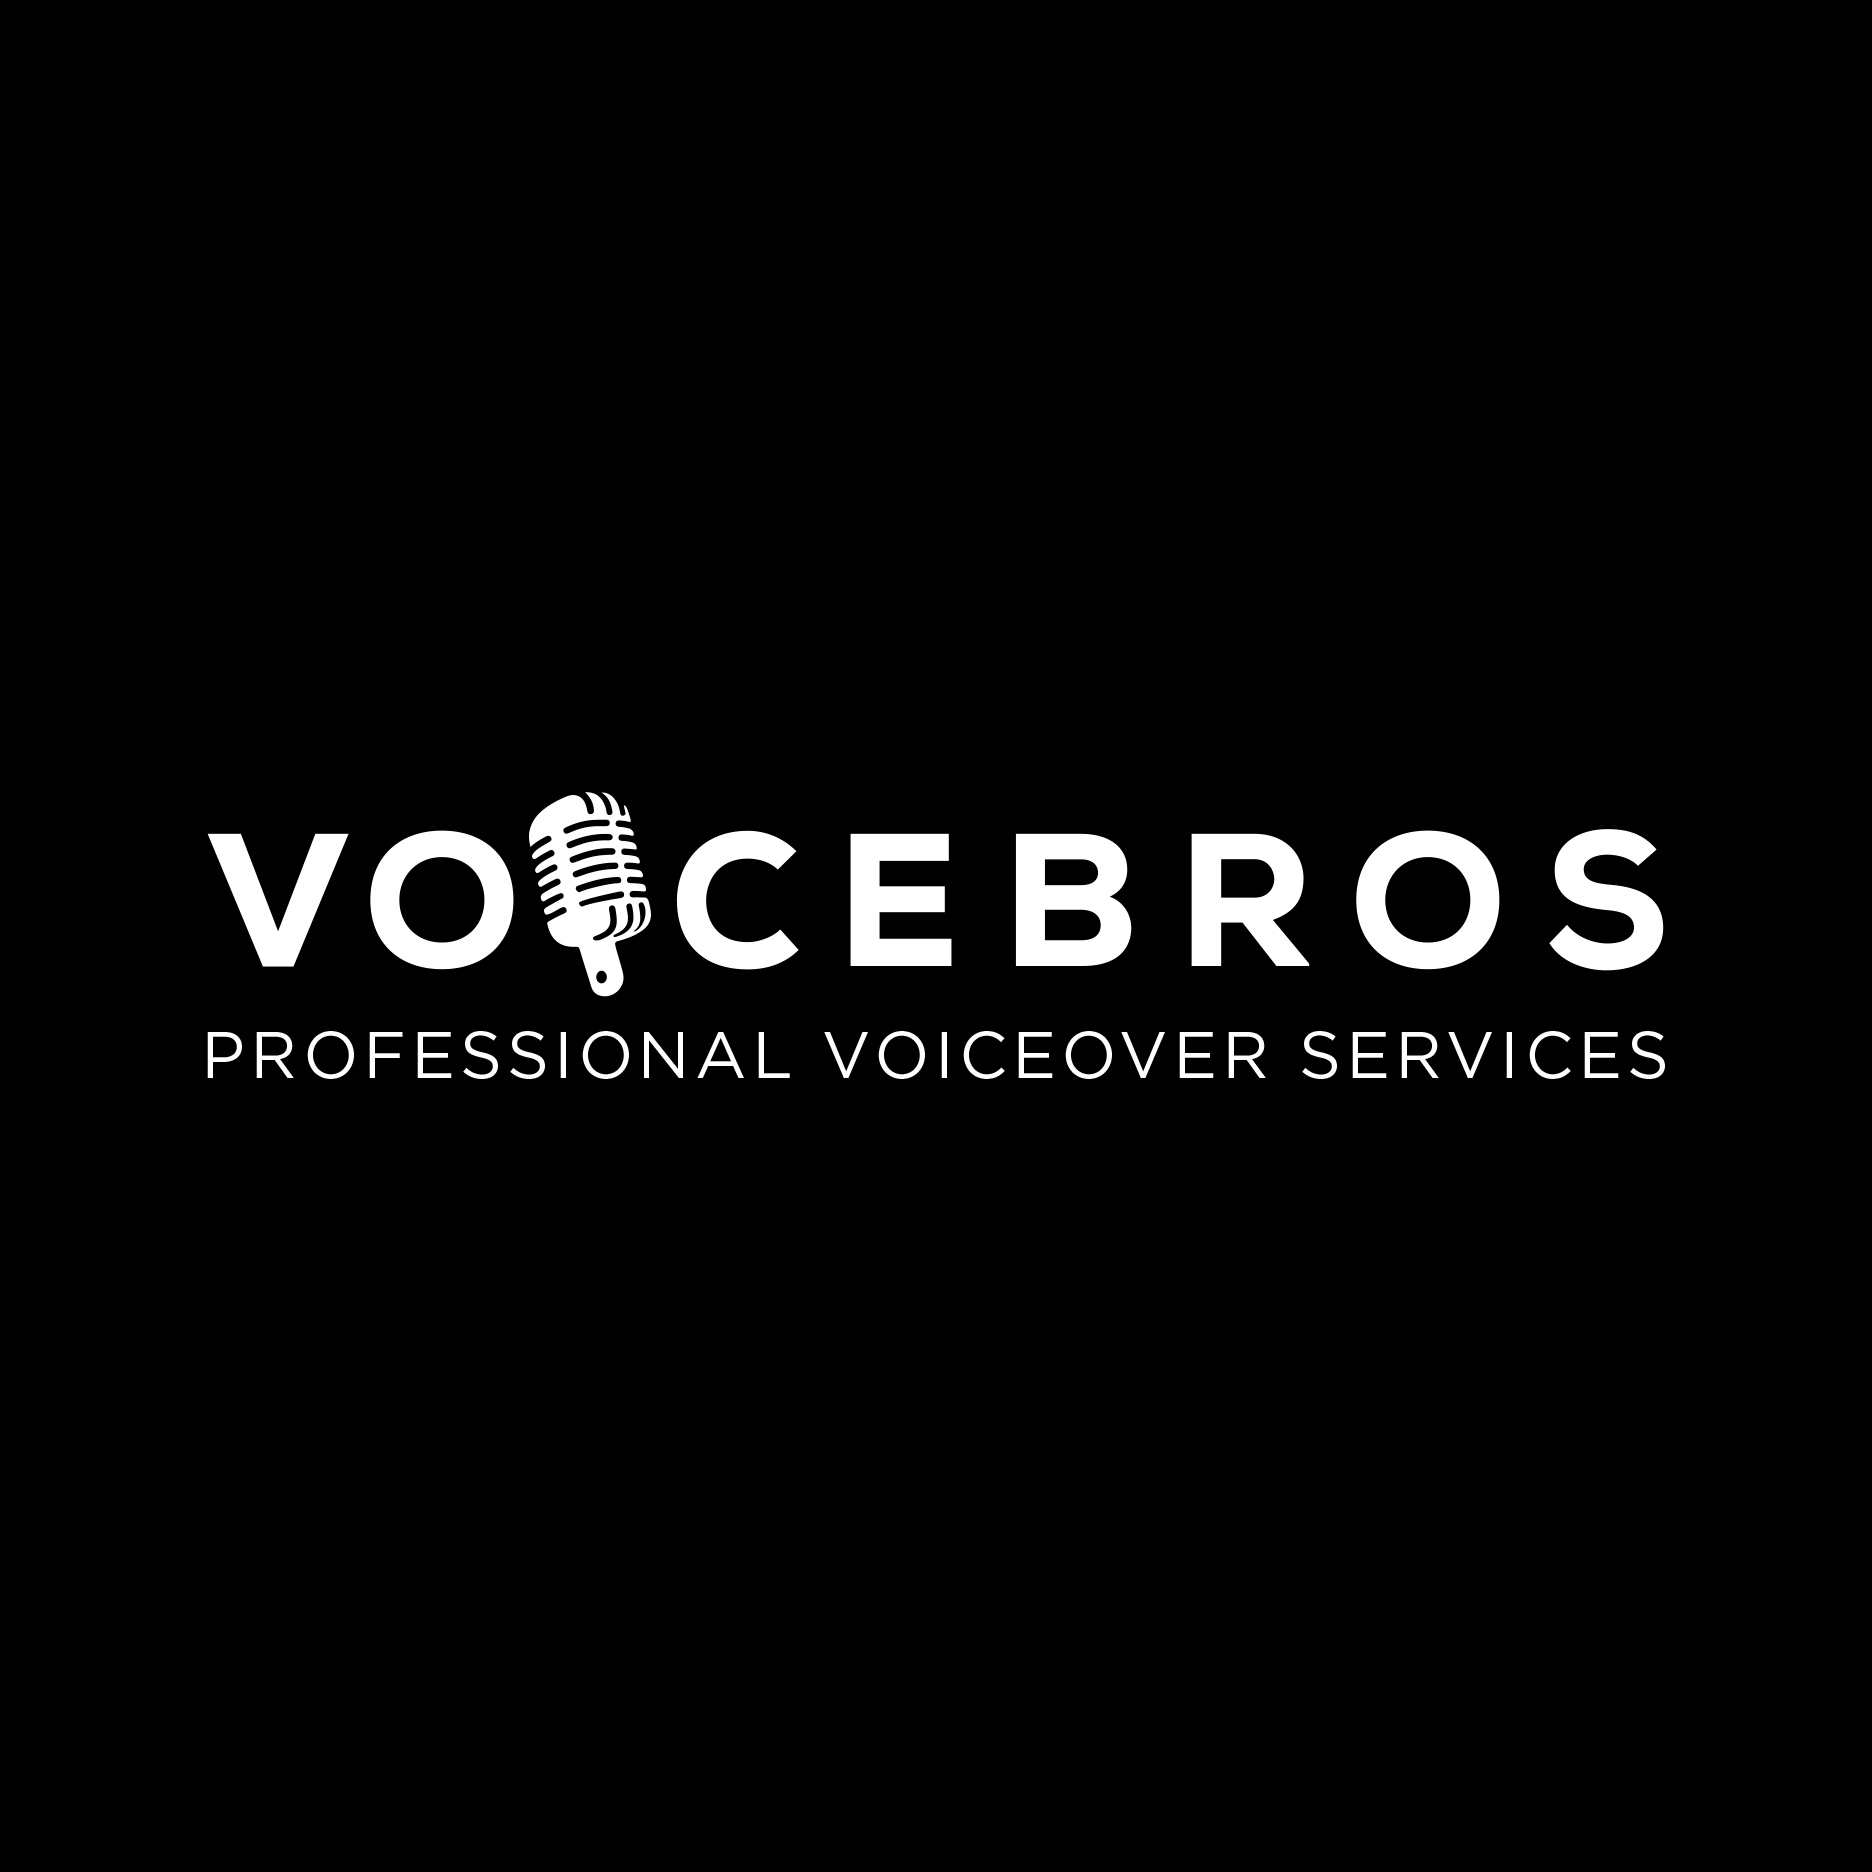 Alina E. is a voice over actor